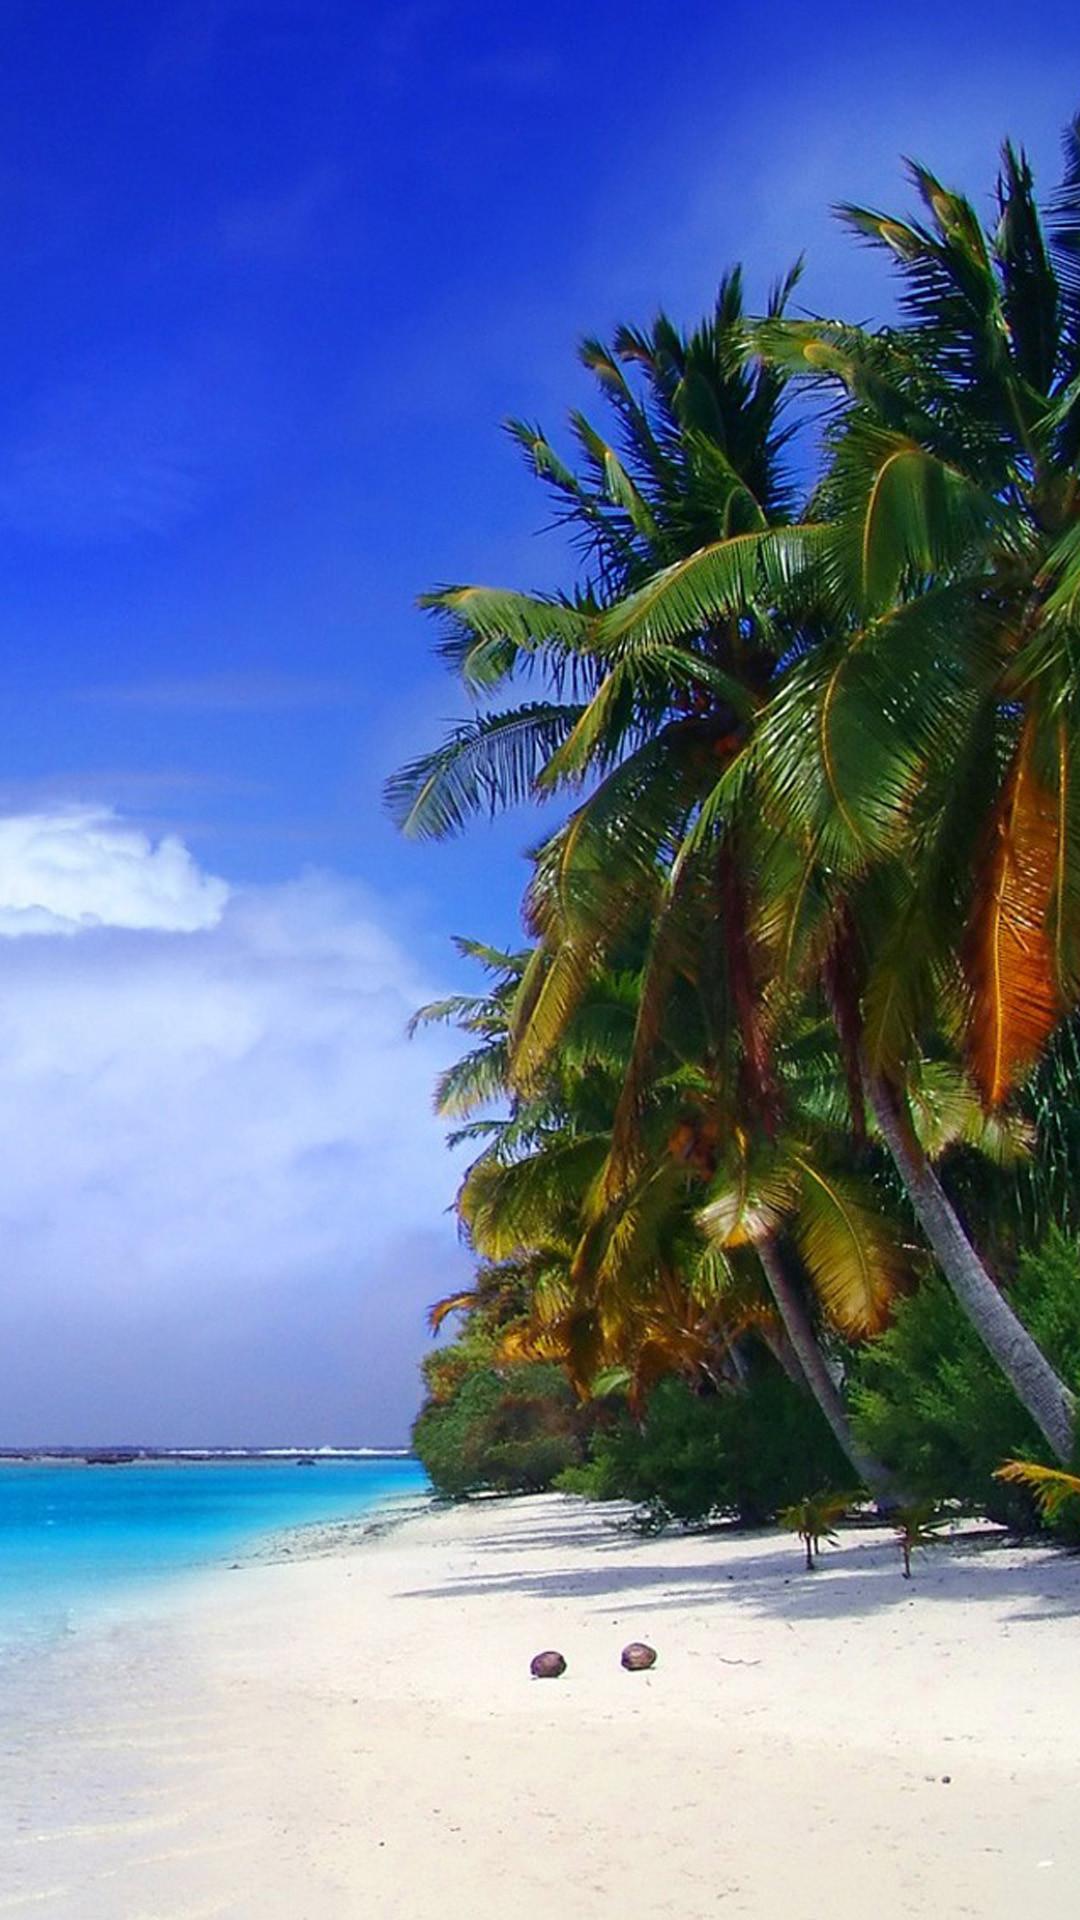 Sunny Beach [1080×1920] Need #iPhone #6S #Plus #Wallpaper/ #